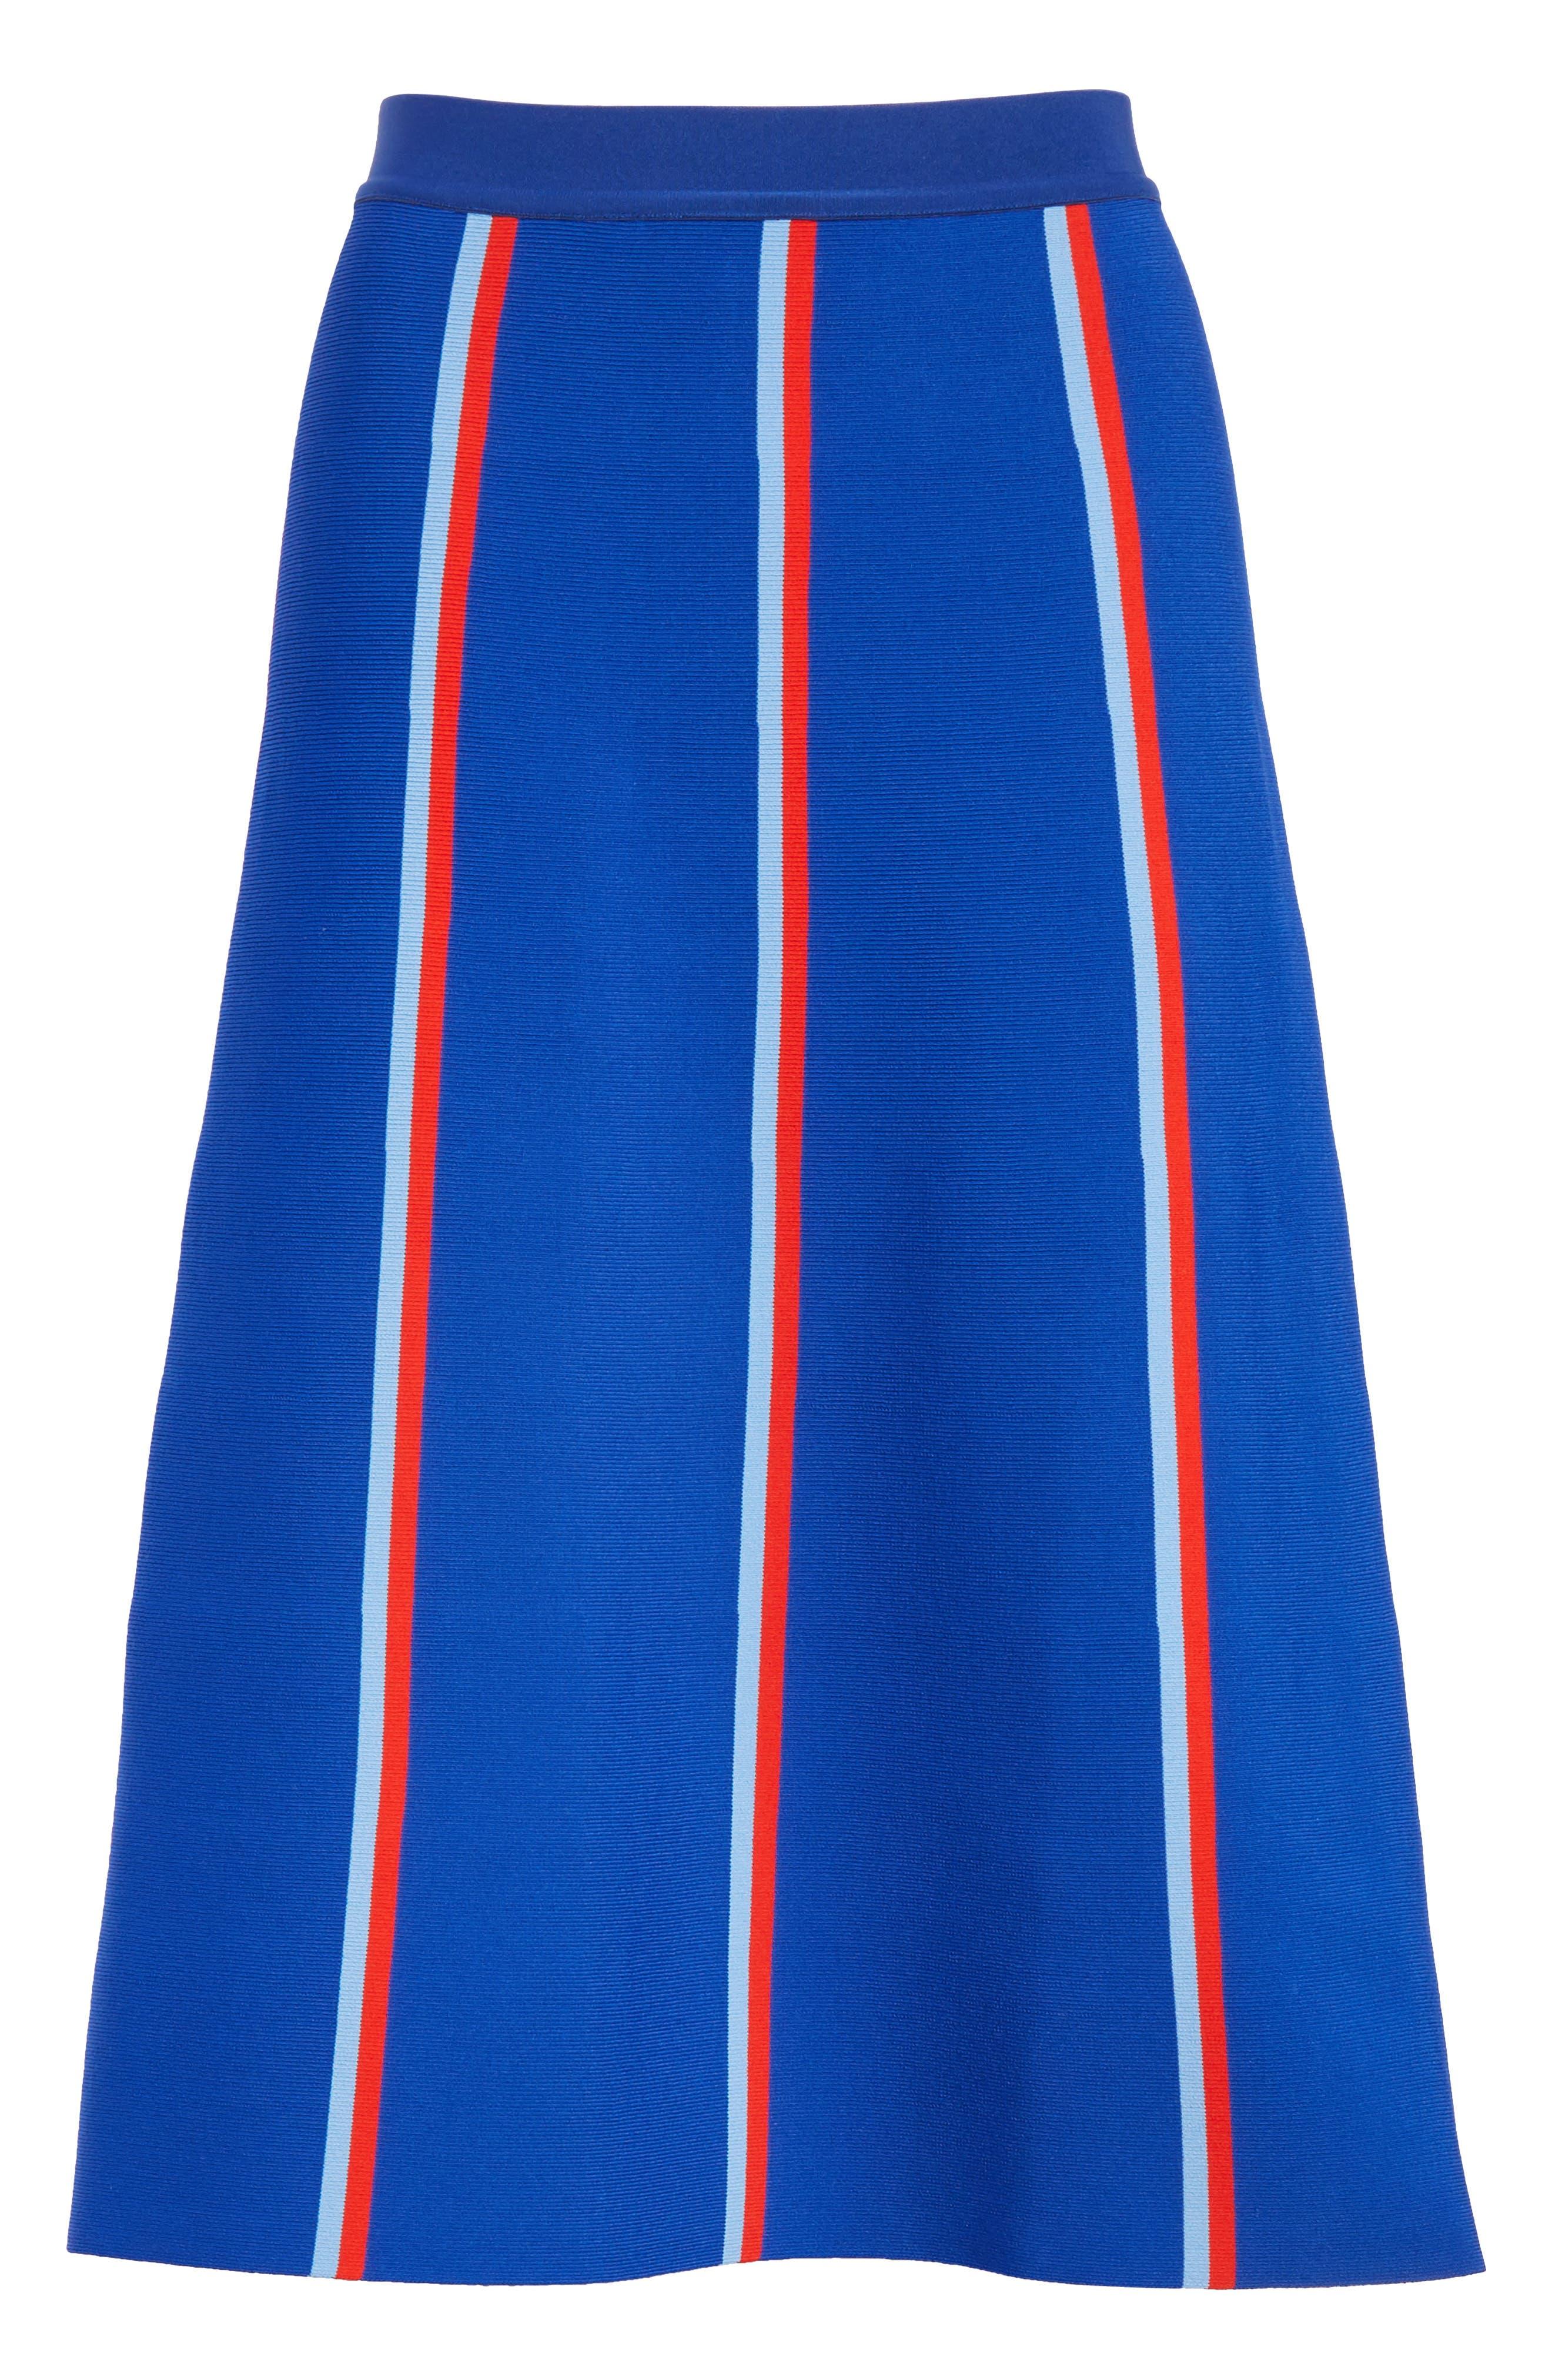 Twin Stripe Tech Knit Skirt,                             Alternate thumbnail 6, color,                             SLALOM BLUE